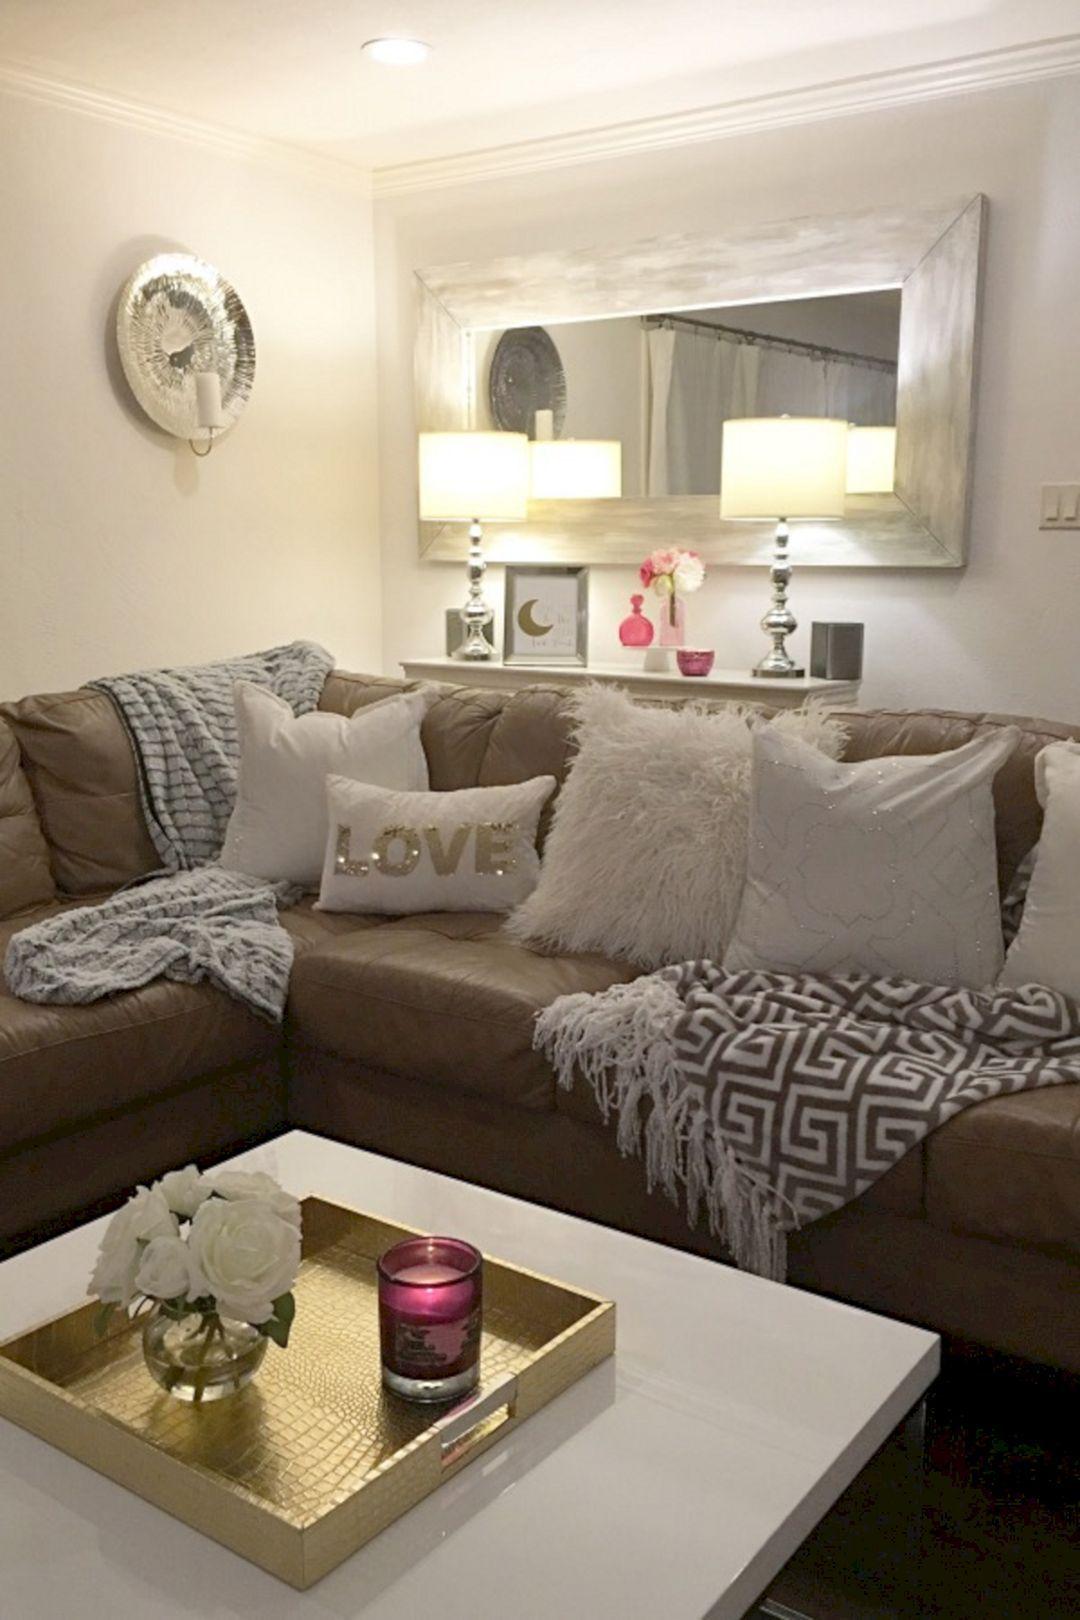 80 Stunning Small Living Room Decor Ideas For Your Apartment 025 College Apartment Decor Small Living Room Decor College Living Rooms